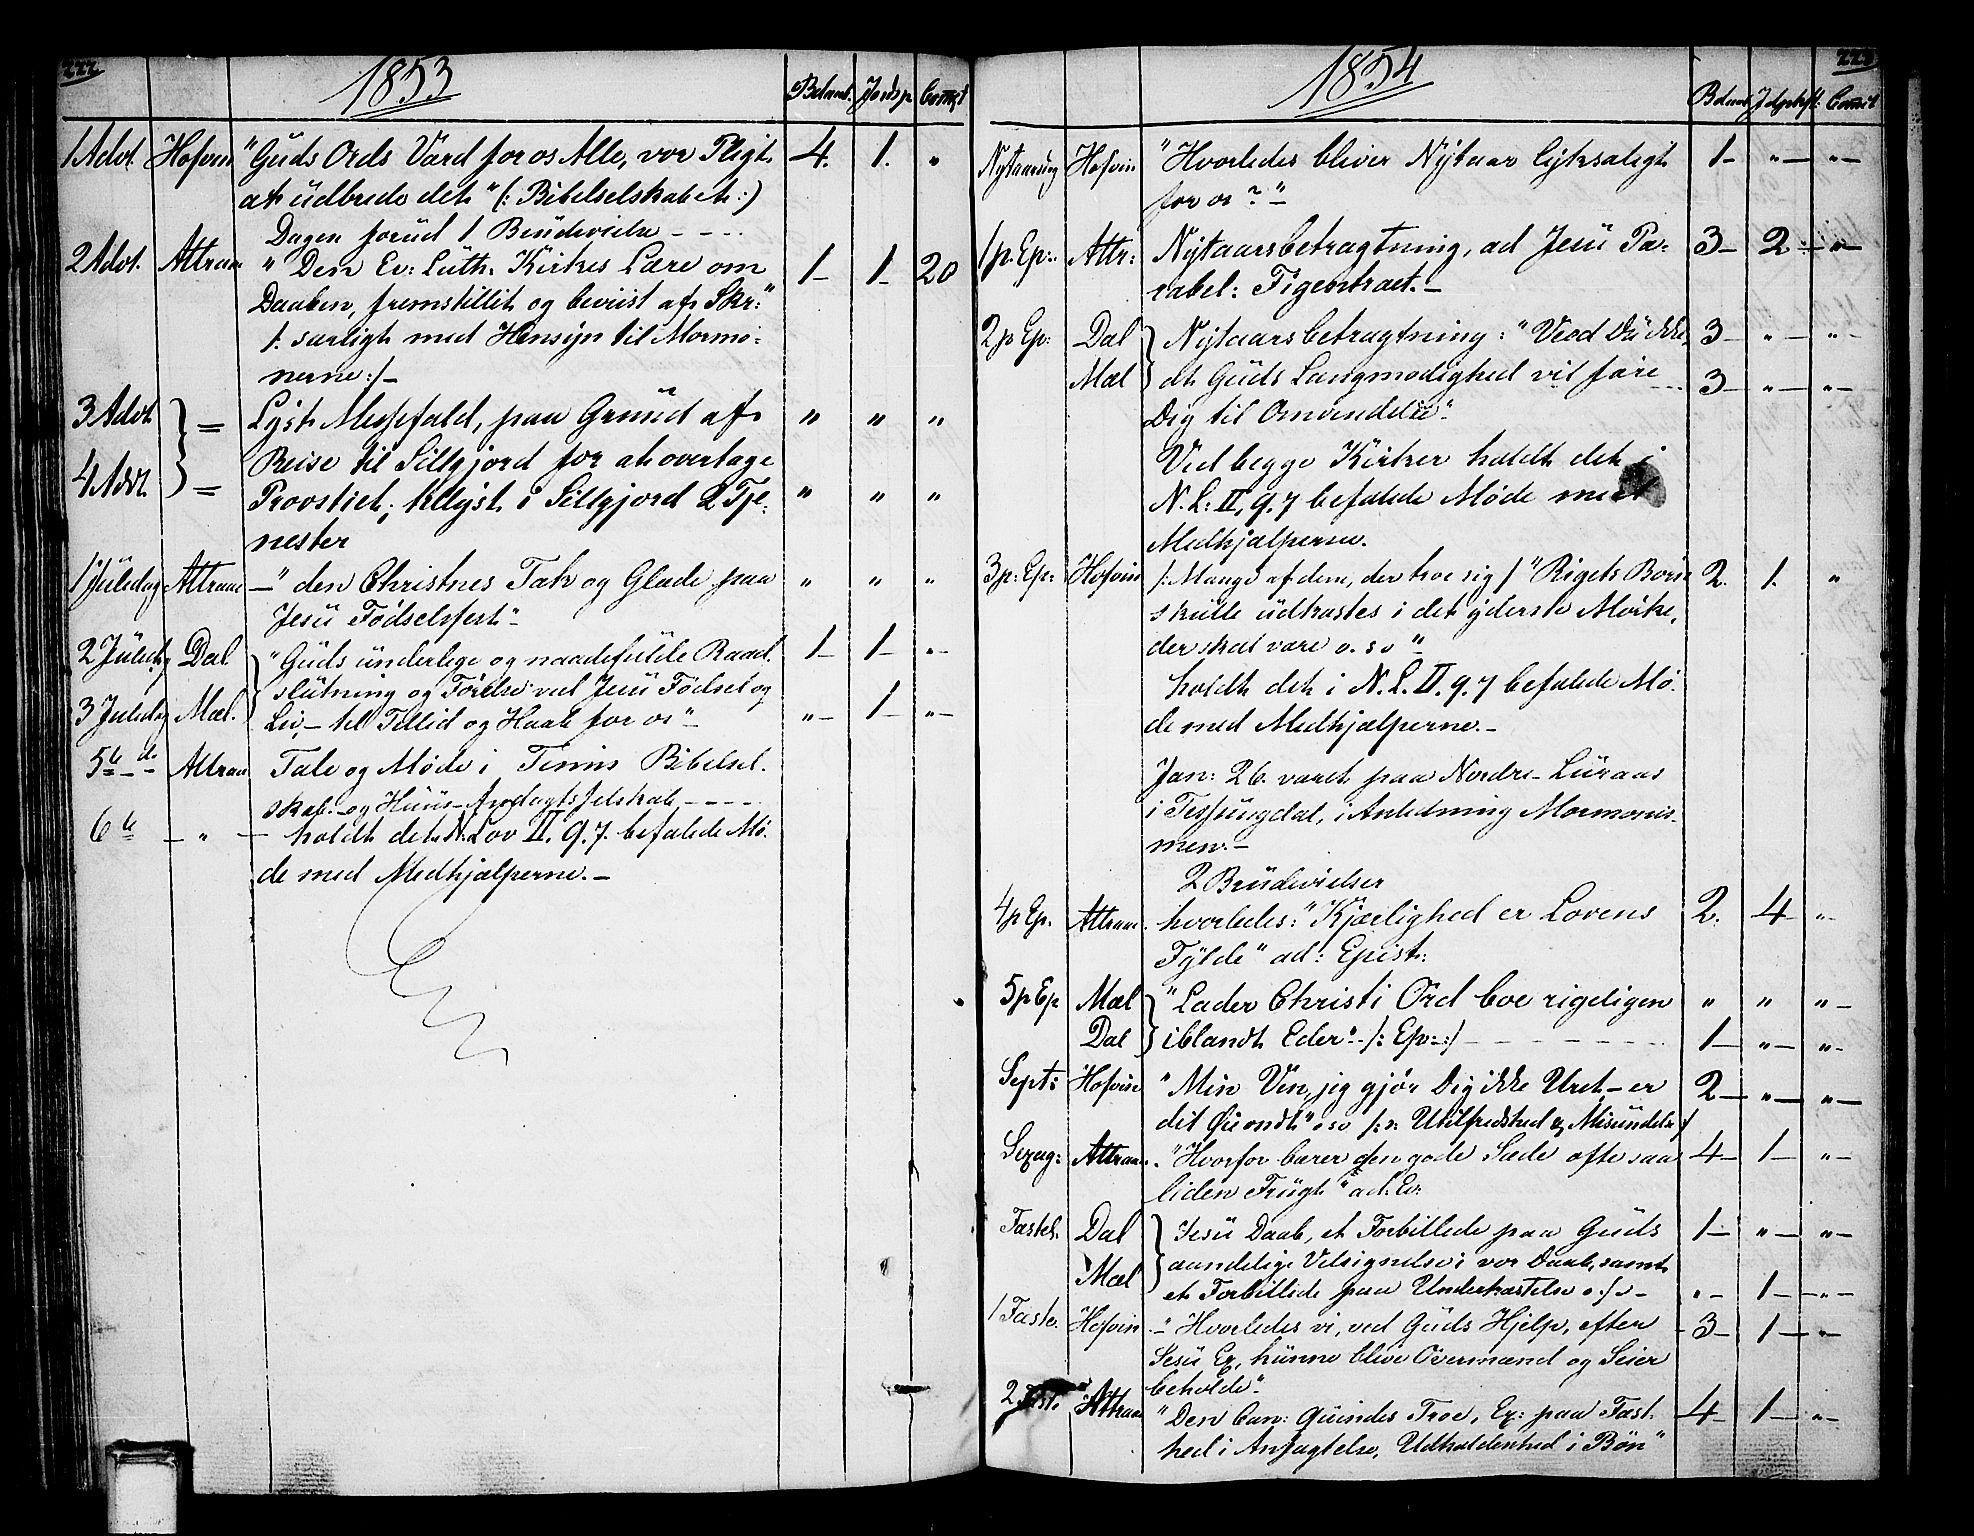 SAKO, Tinn kirkebøker, F/Fa/L0003: Ministerialbok nr. I 3, 1810-1814, s. 222-223